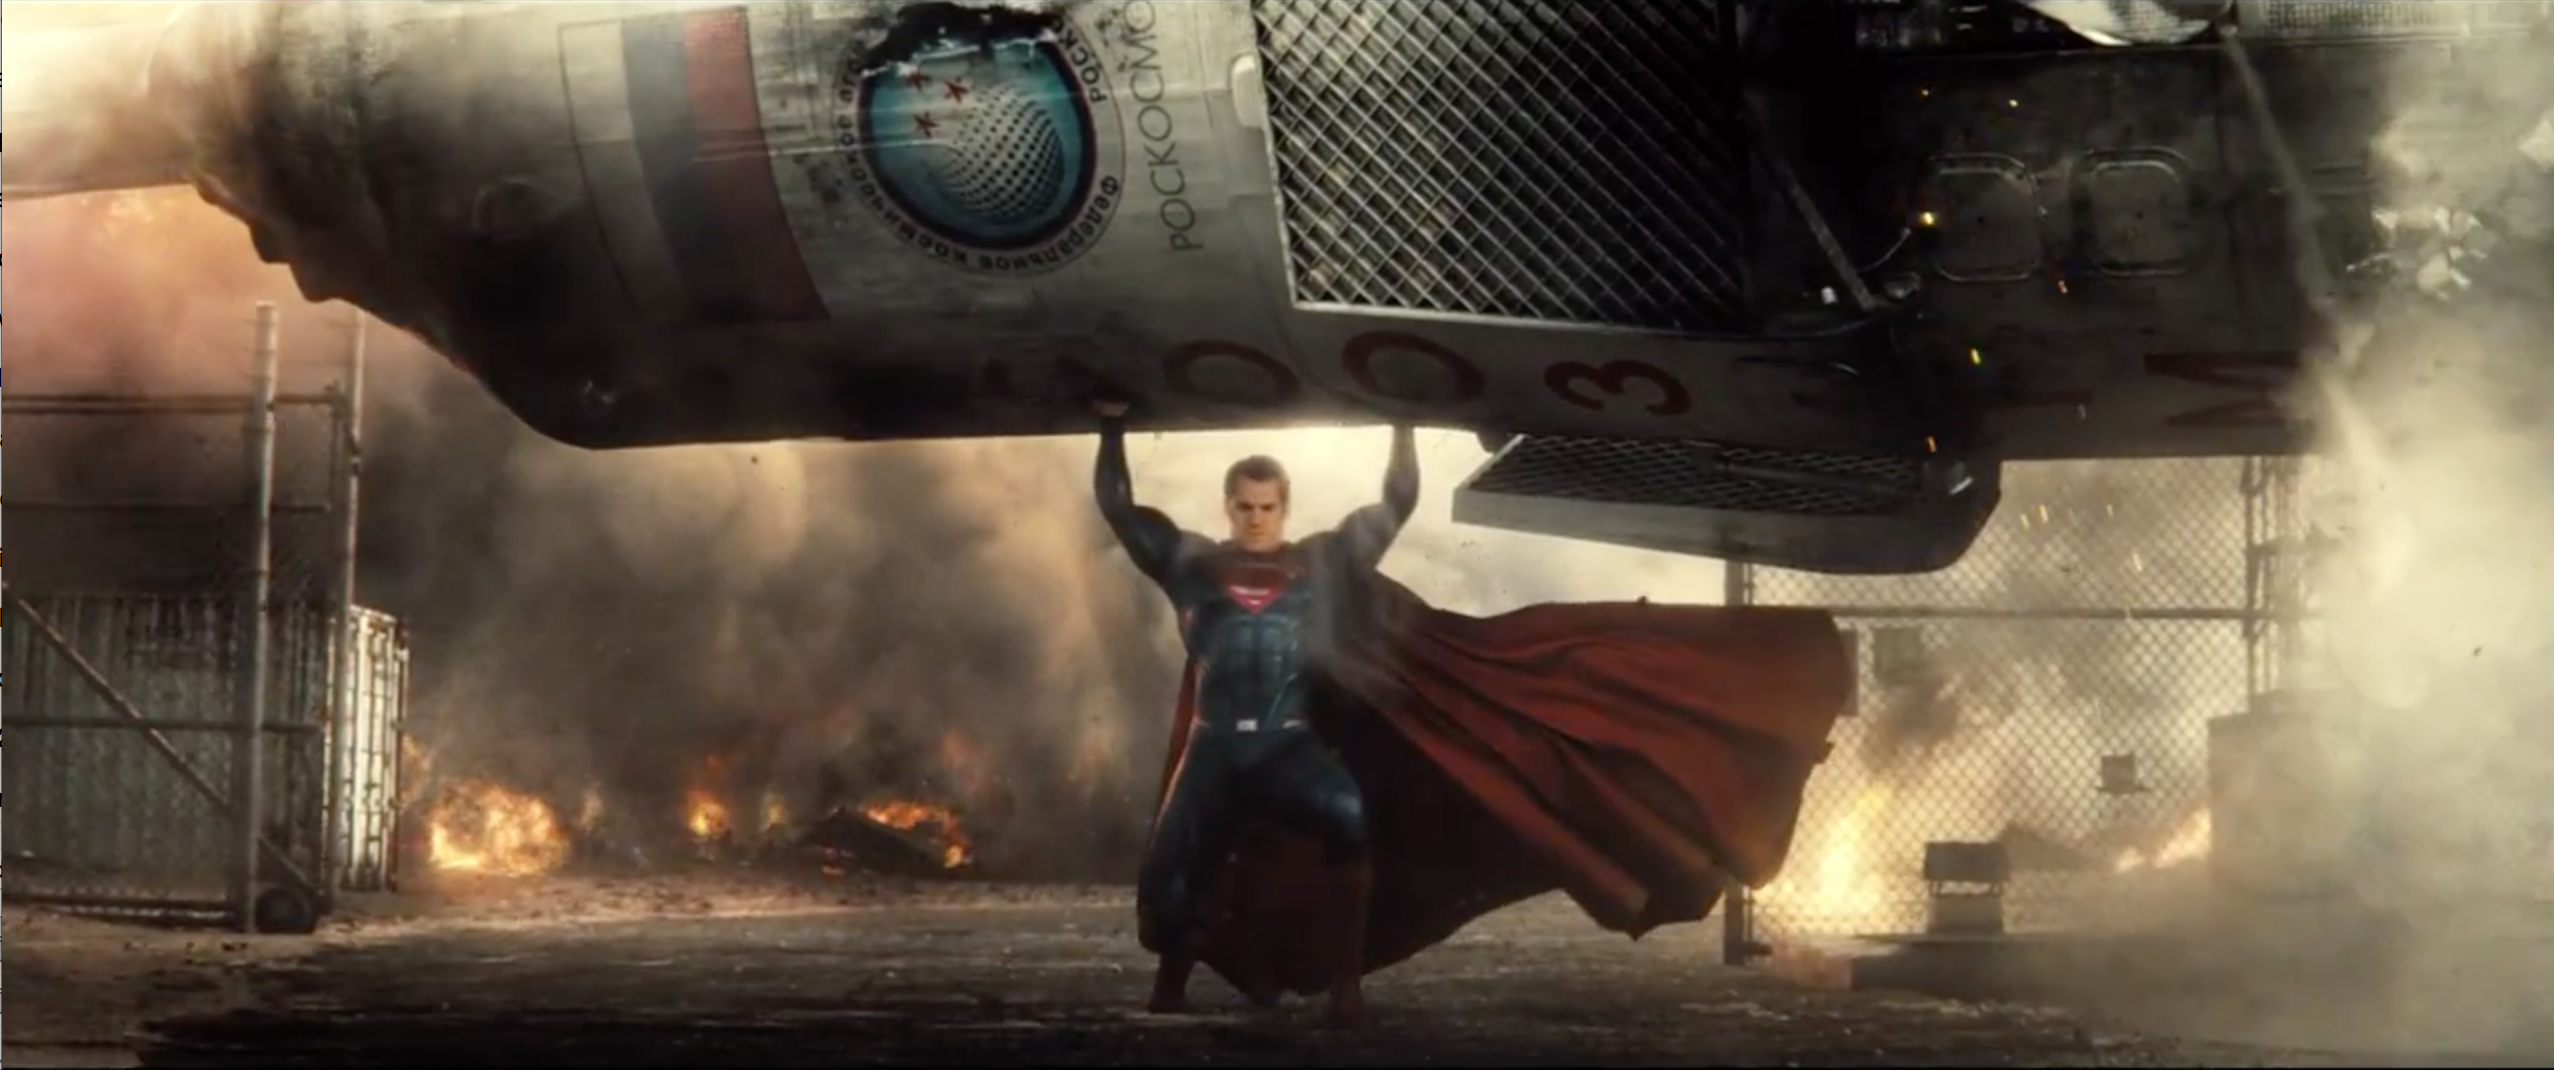 Batman v Superman: Dawn of Justice: Henry Cavill nel trailer del film